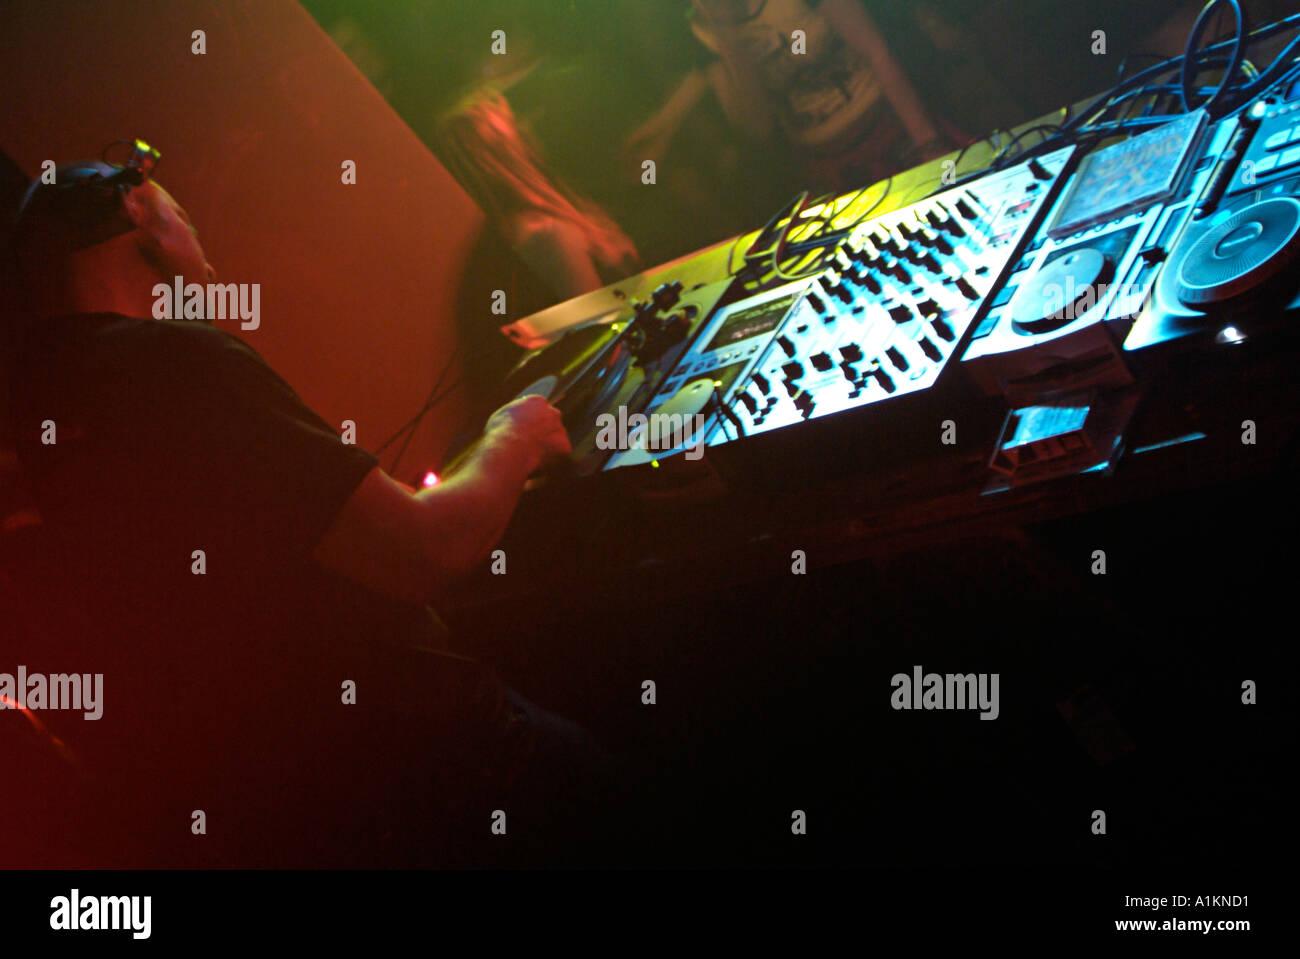 Club DJ Using a Turntable on the Decks of a Nightclub - Stock Image